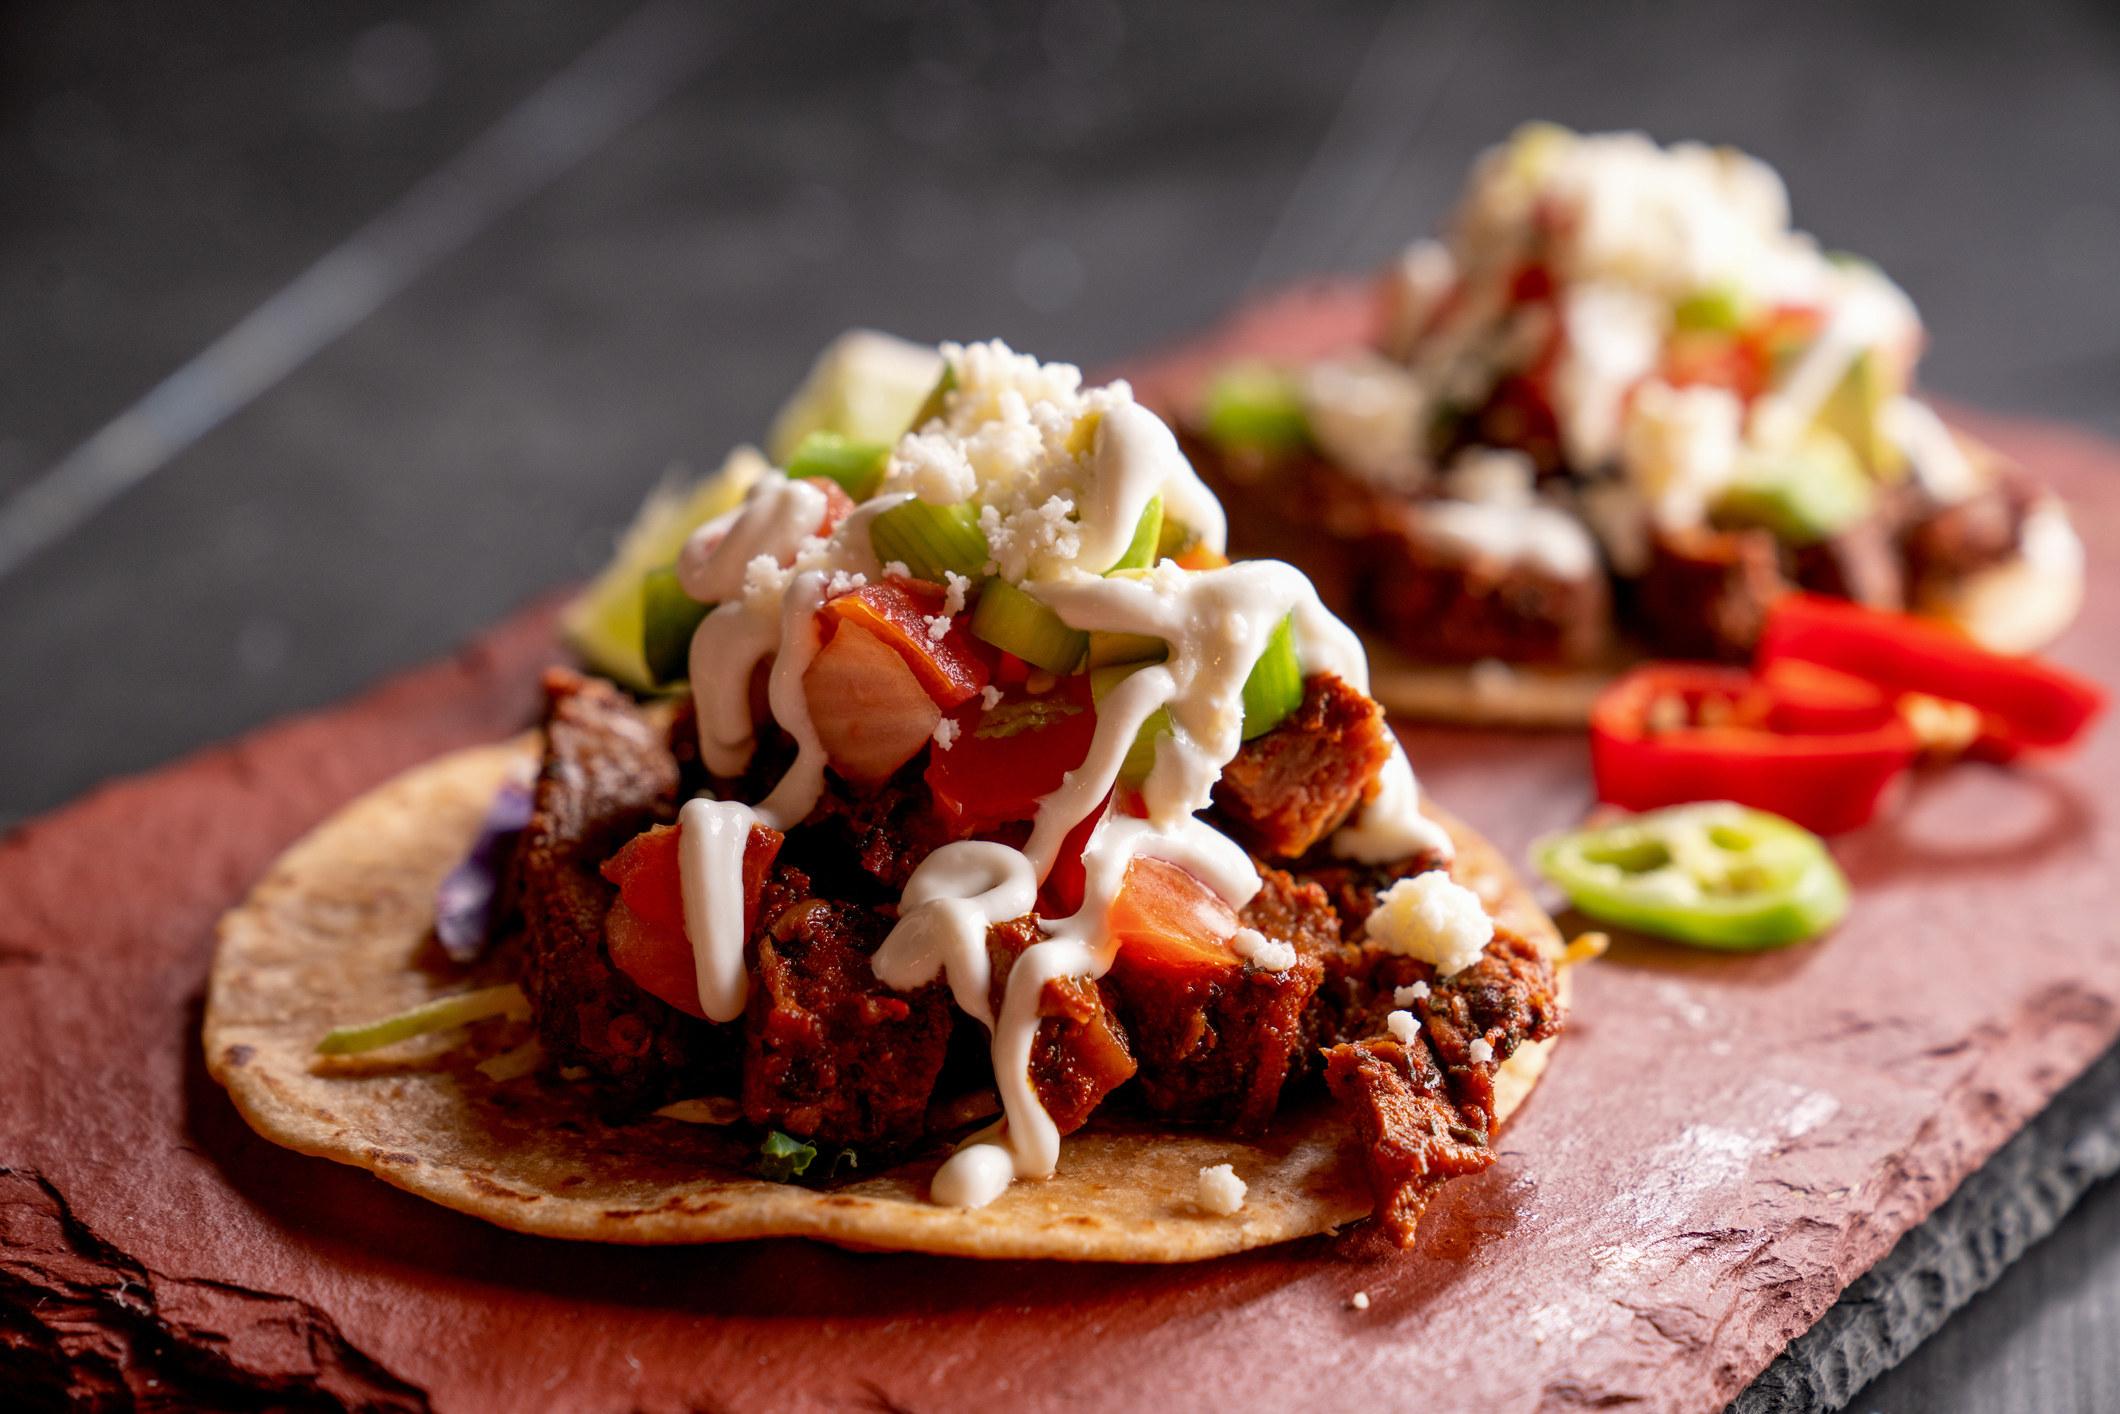 Two carne asada tacos